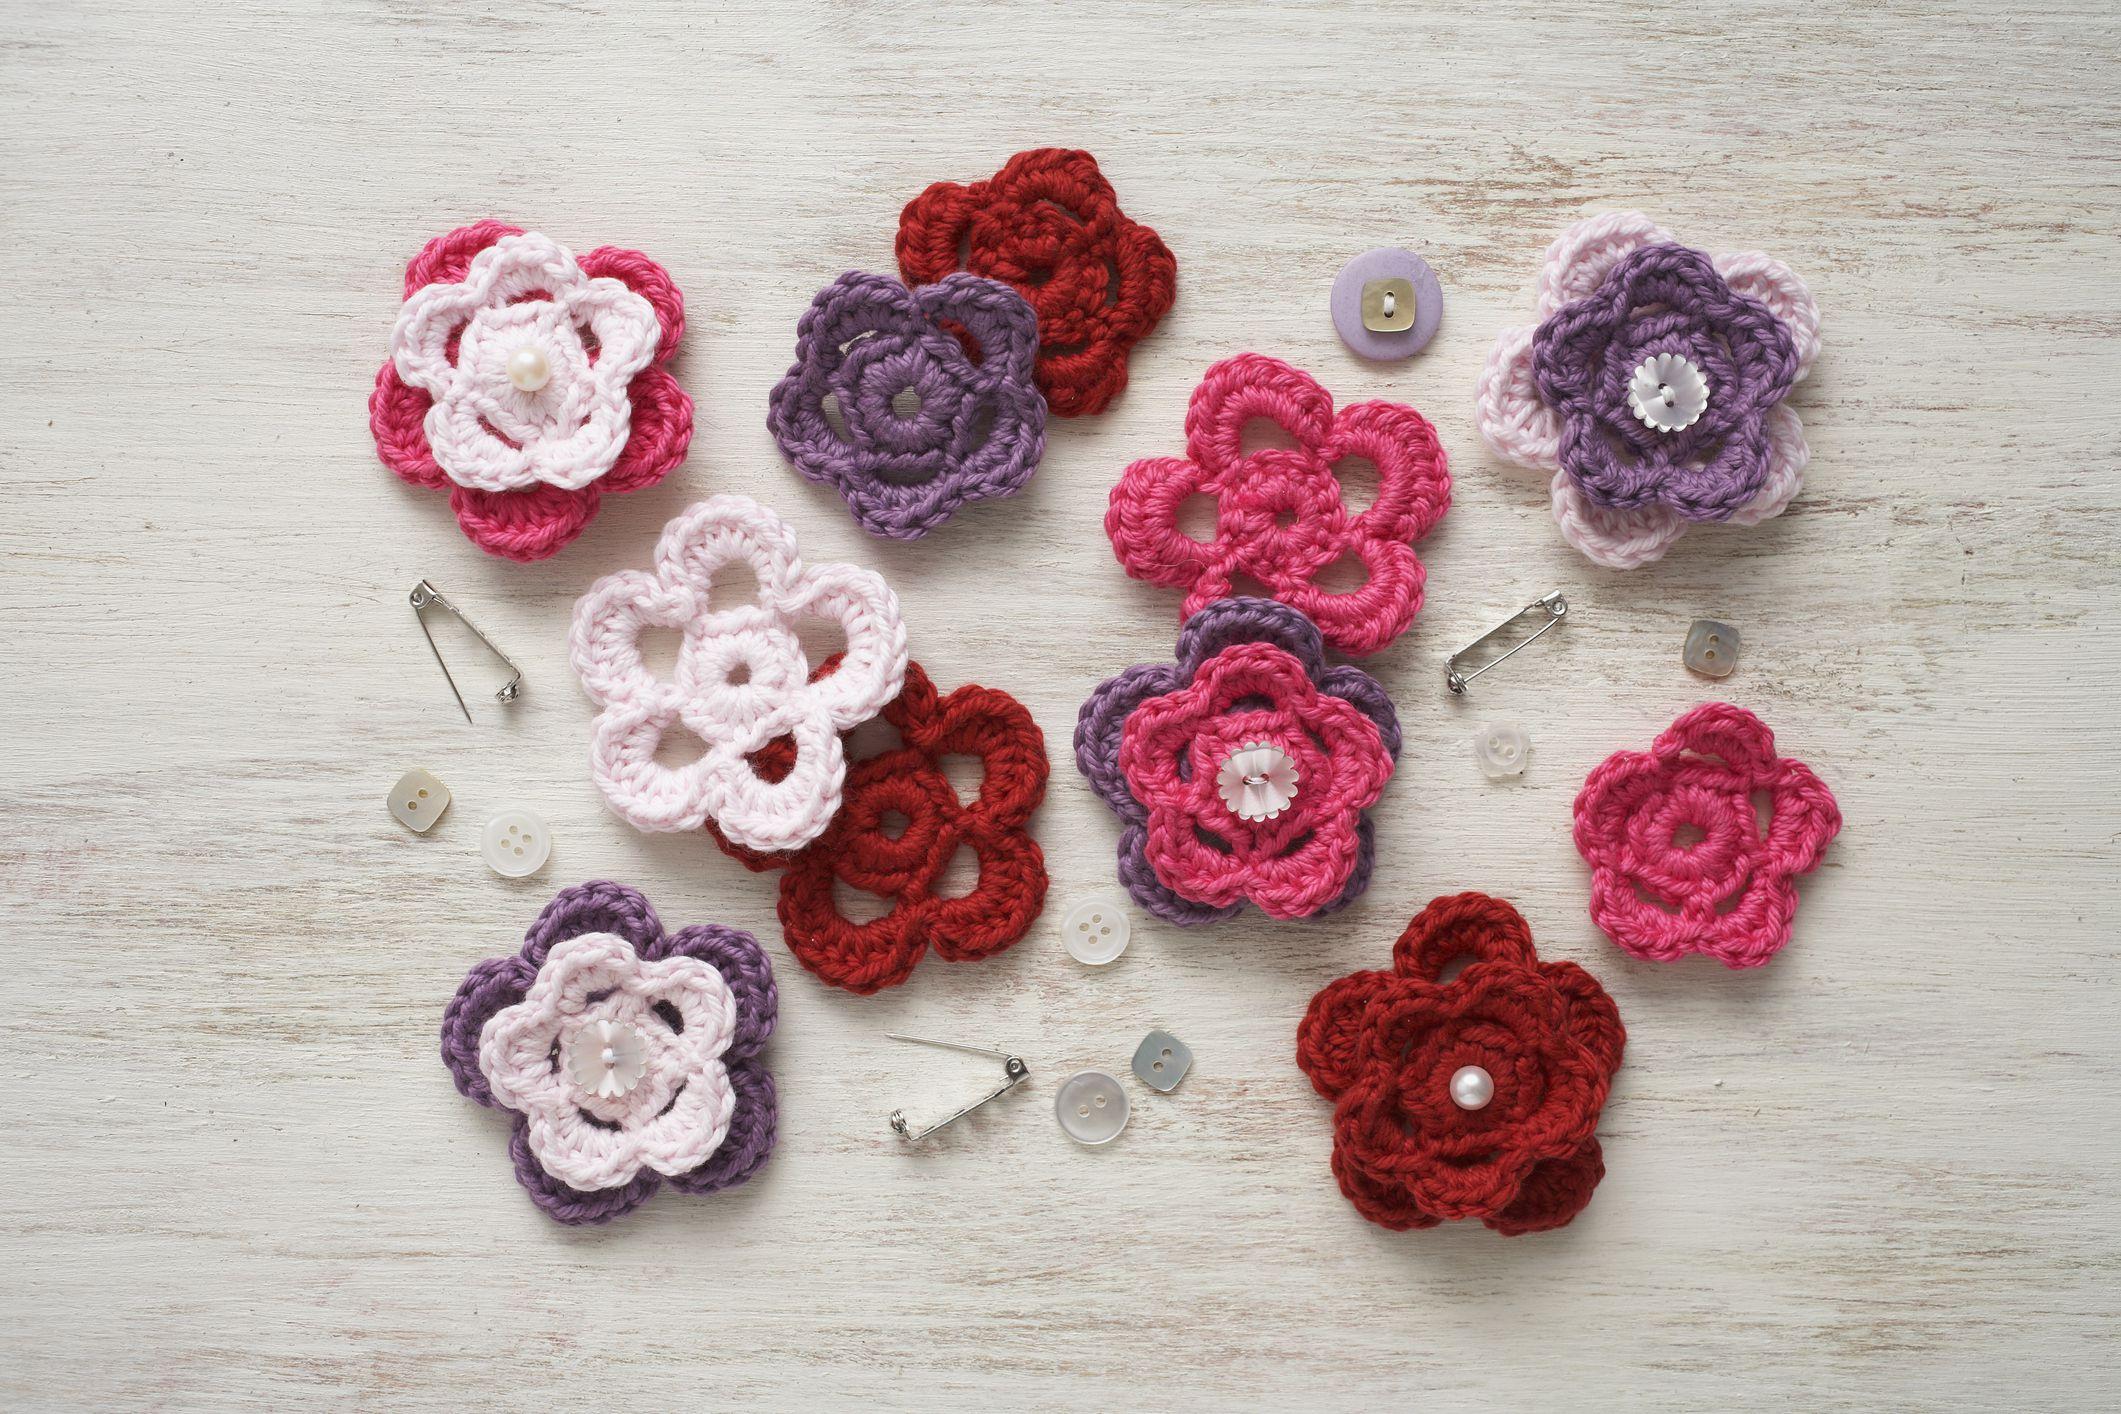 Easy Crochet Patterns For Free